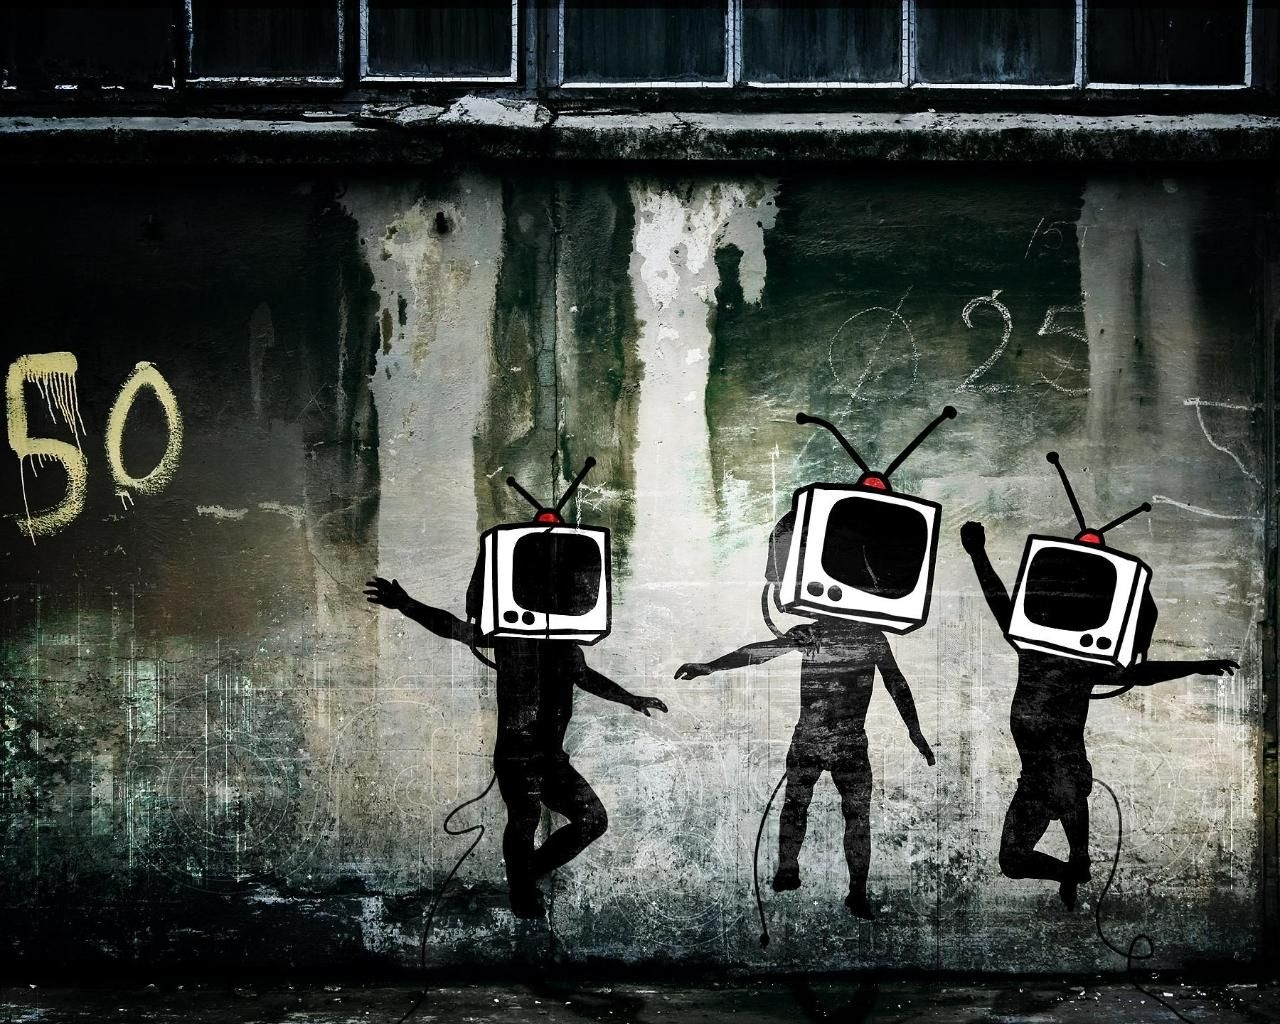 urban street art wallpaper tv man urban graffiti wallpaper | urban